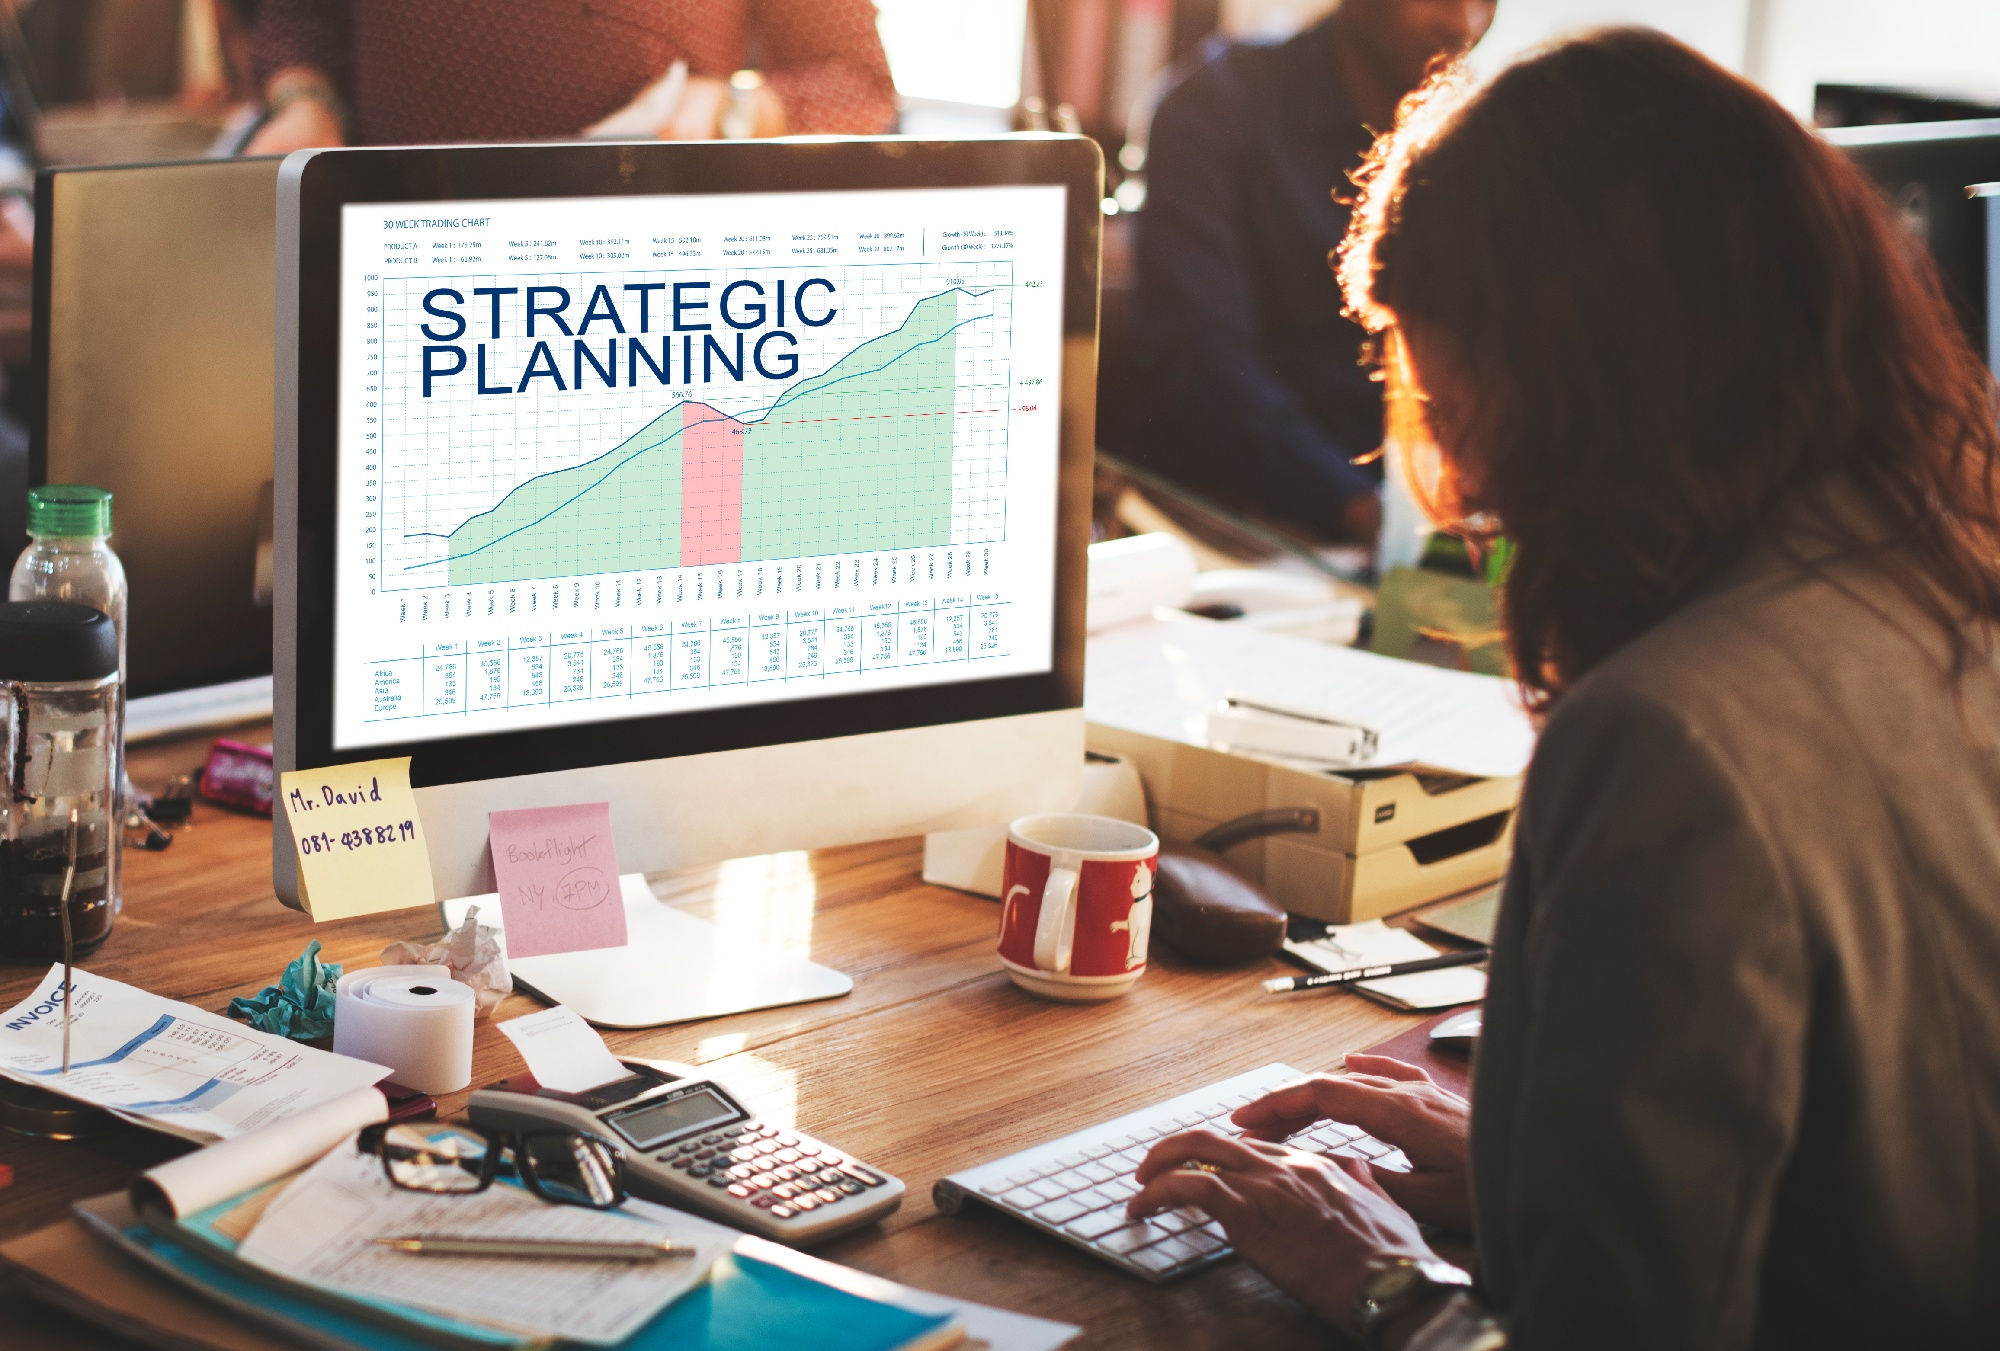 strategic-plan-graphs-business-marketing-goals-con-P8KLT5K-1